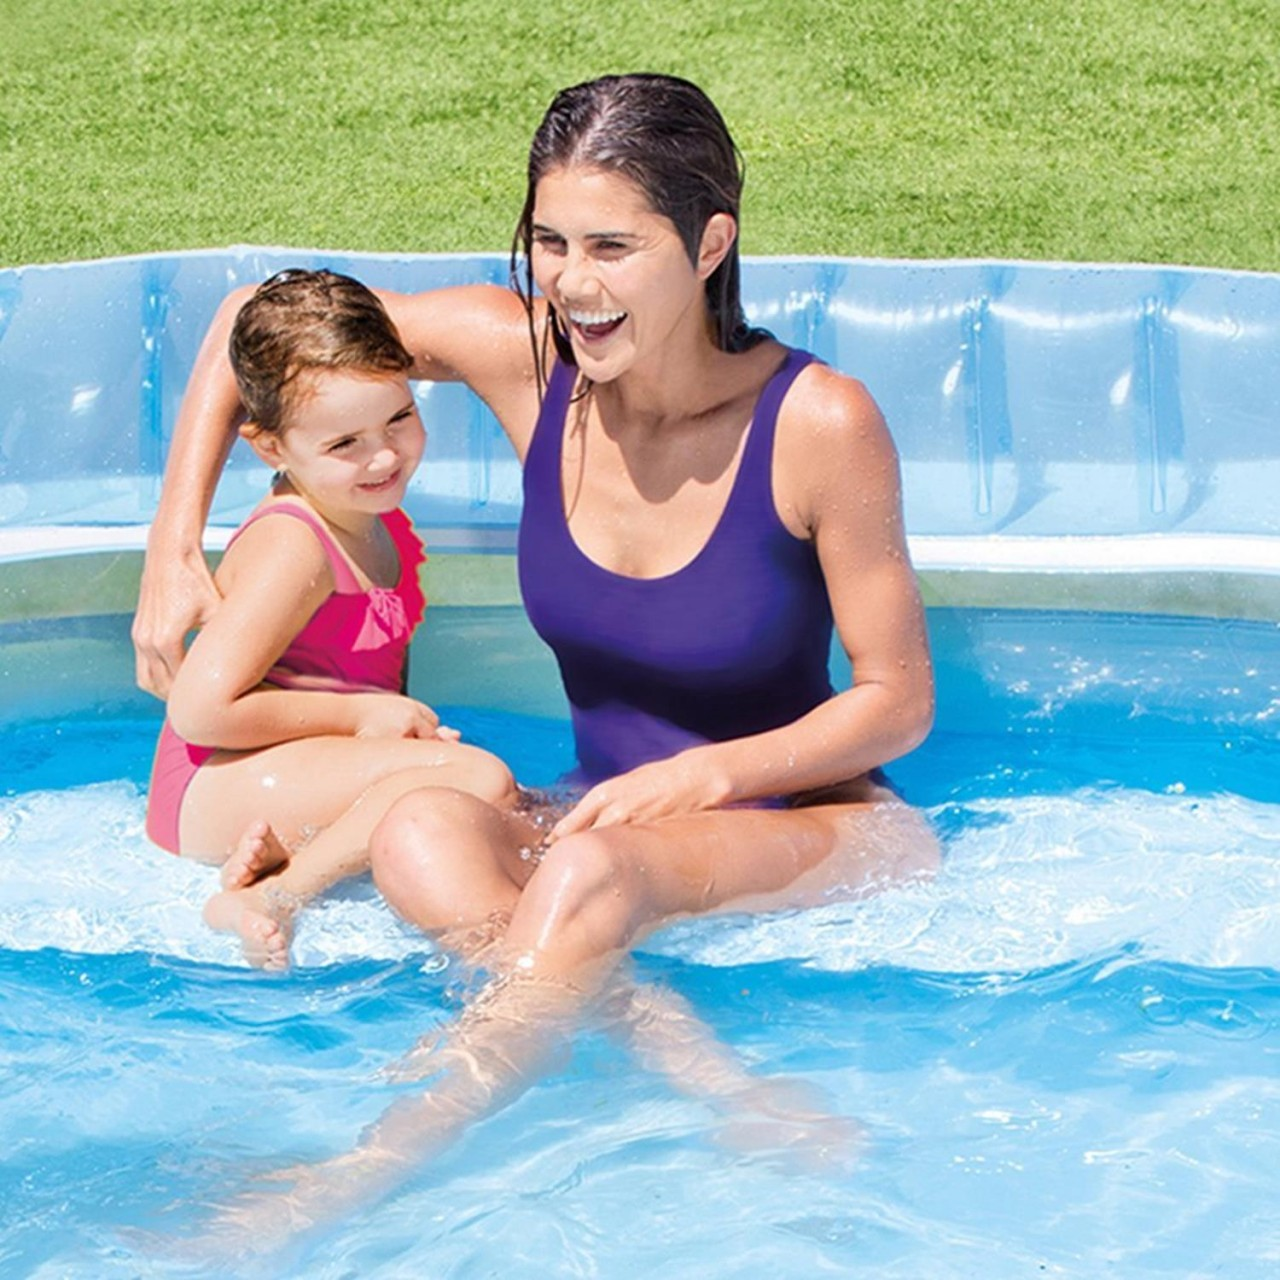 Intex Swim Center Lounge Family Pool Planschbecken Rückenlehne 224 x 216 x 76 cm